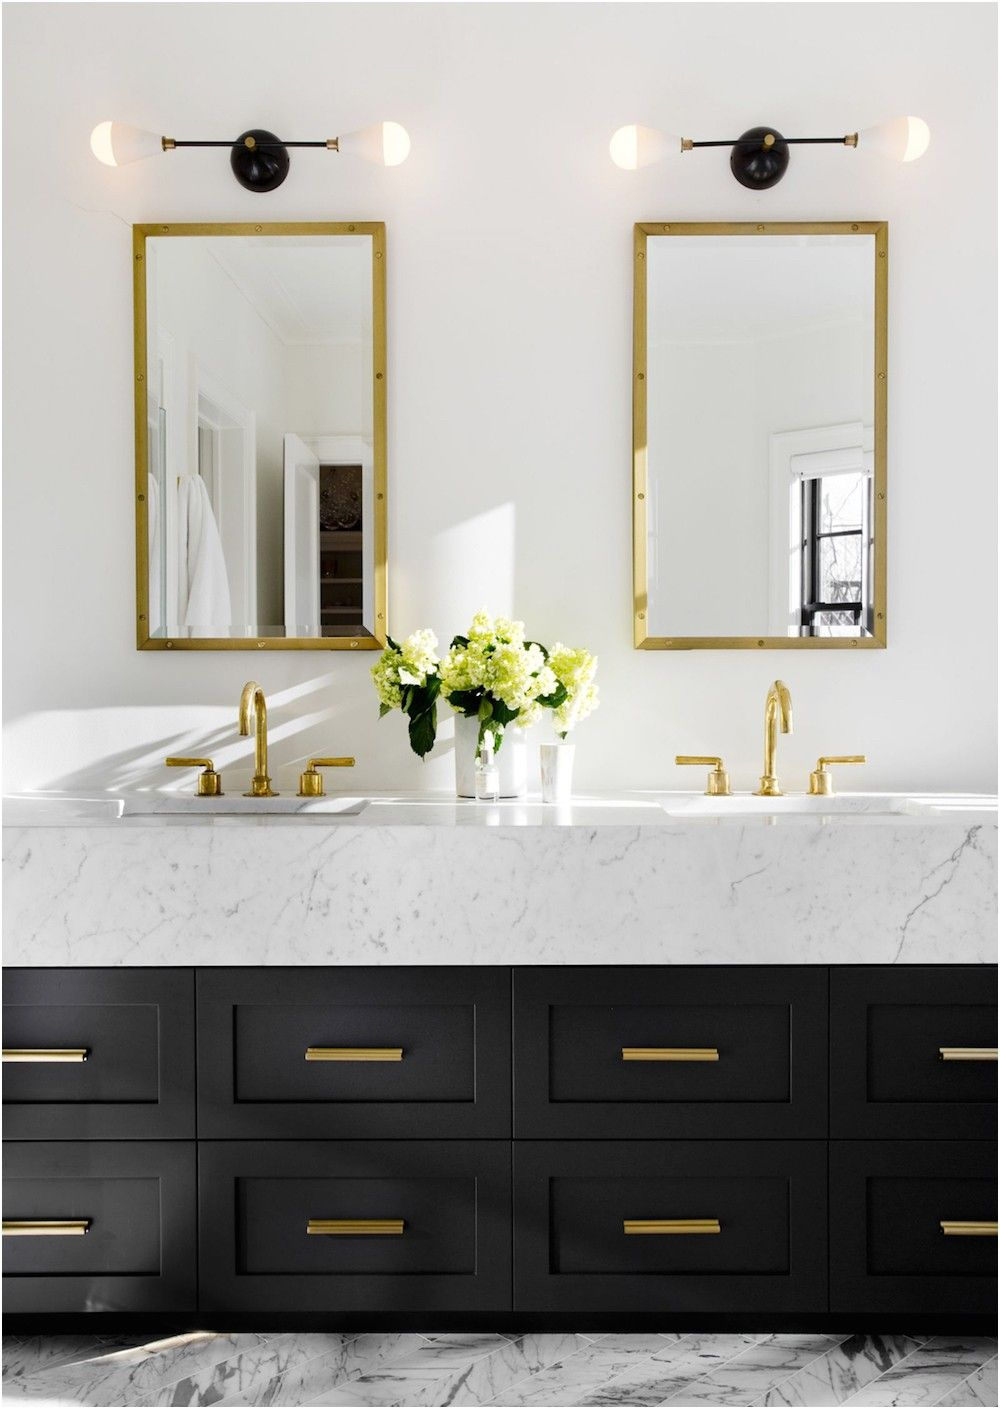 18 Gorgeous Marble Bathrooms With Brass Gold Fixtures From Gold Fixtures Bathroom Kamar Mandi Utama Ide Kamar Mandi Modern